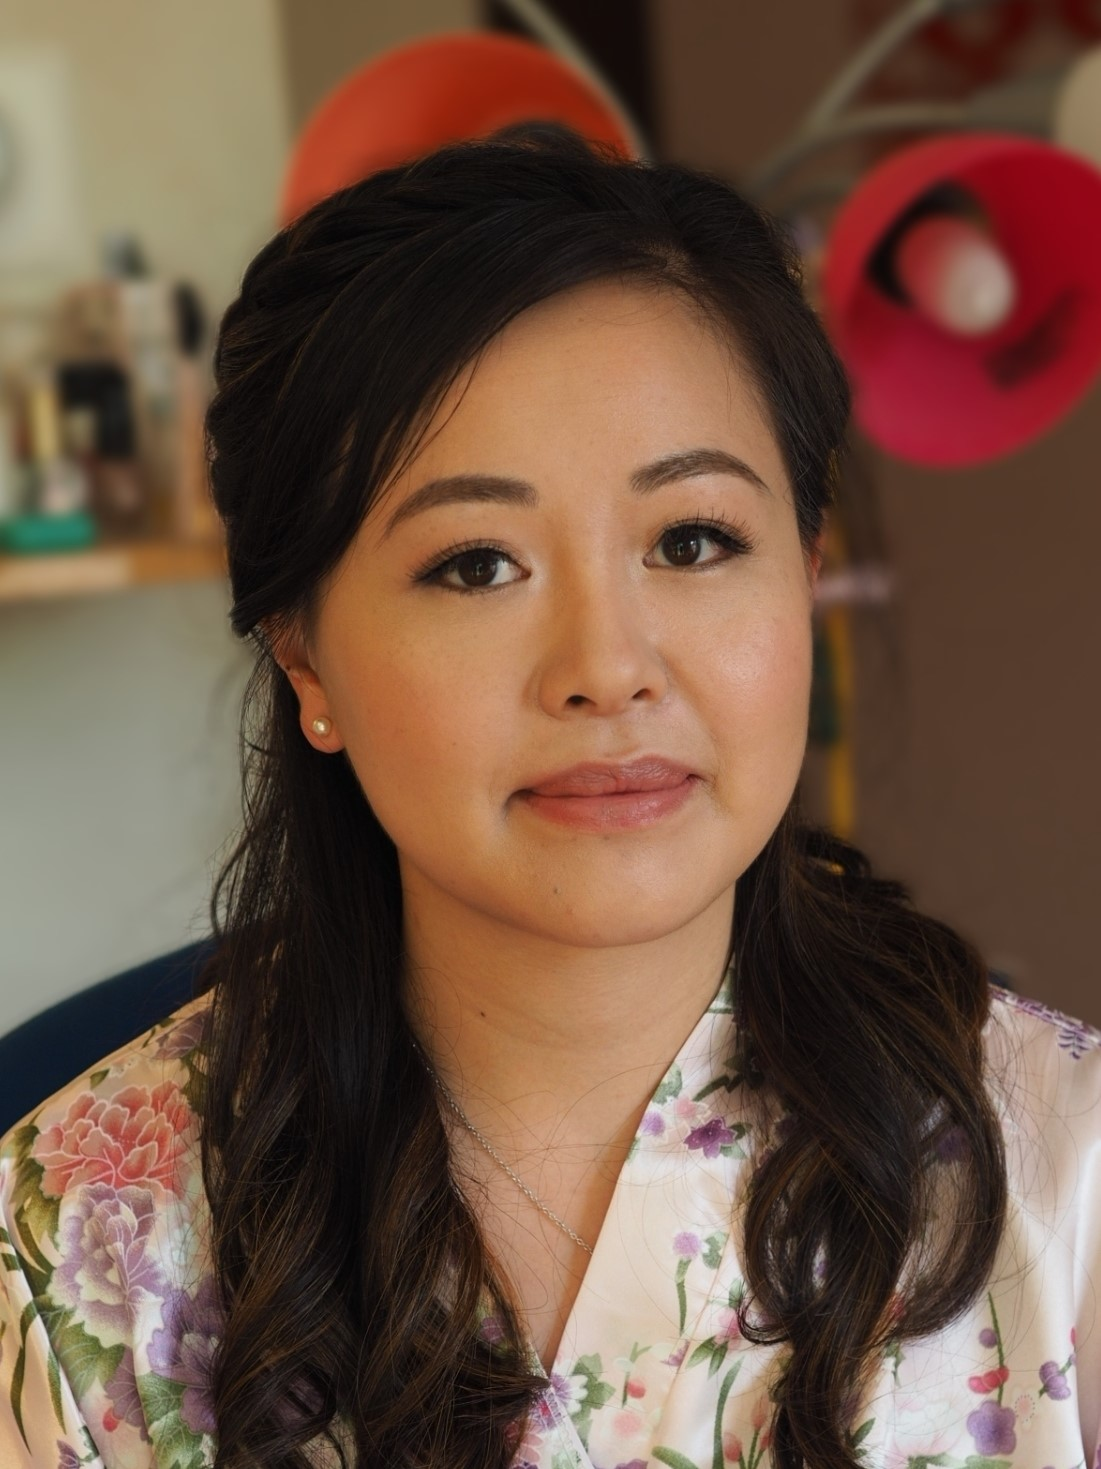 lash extensions bridal makeup artist Asian wedding